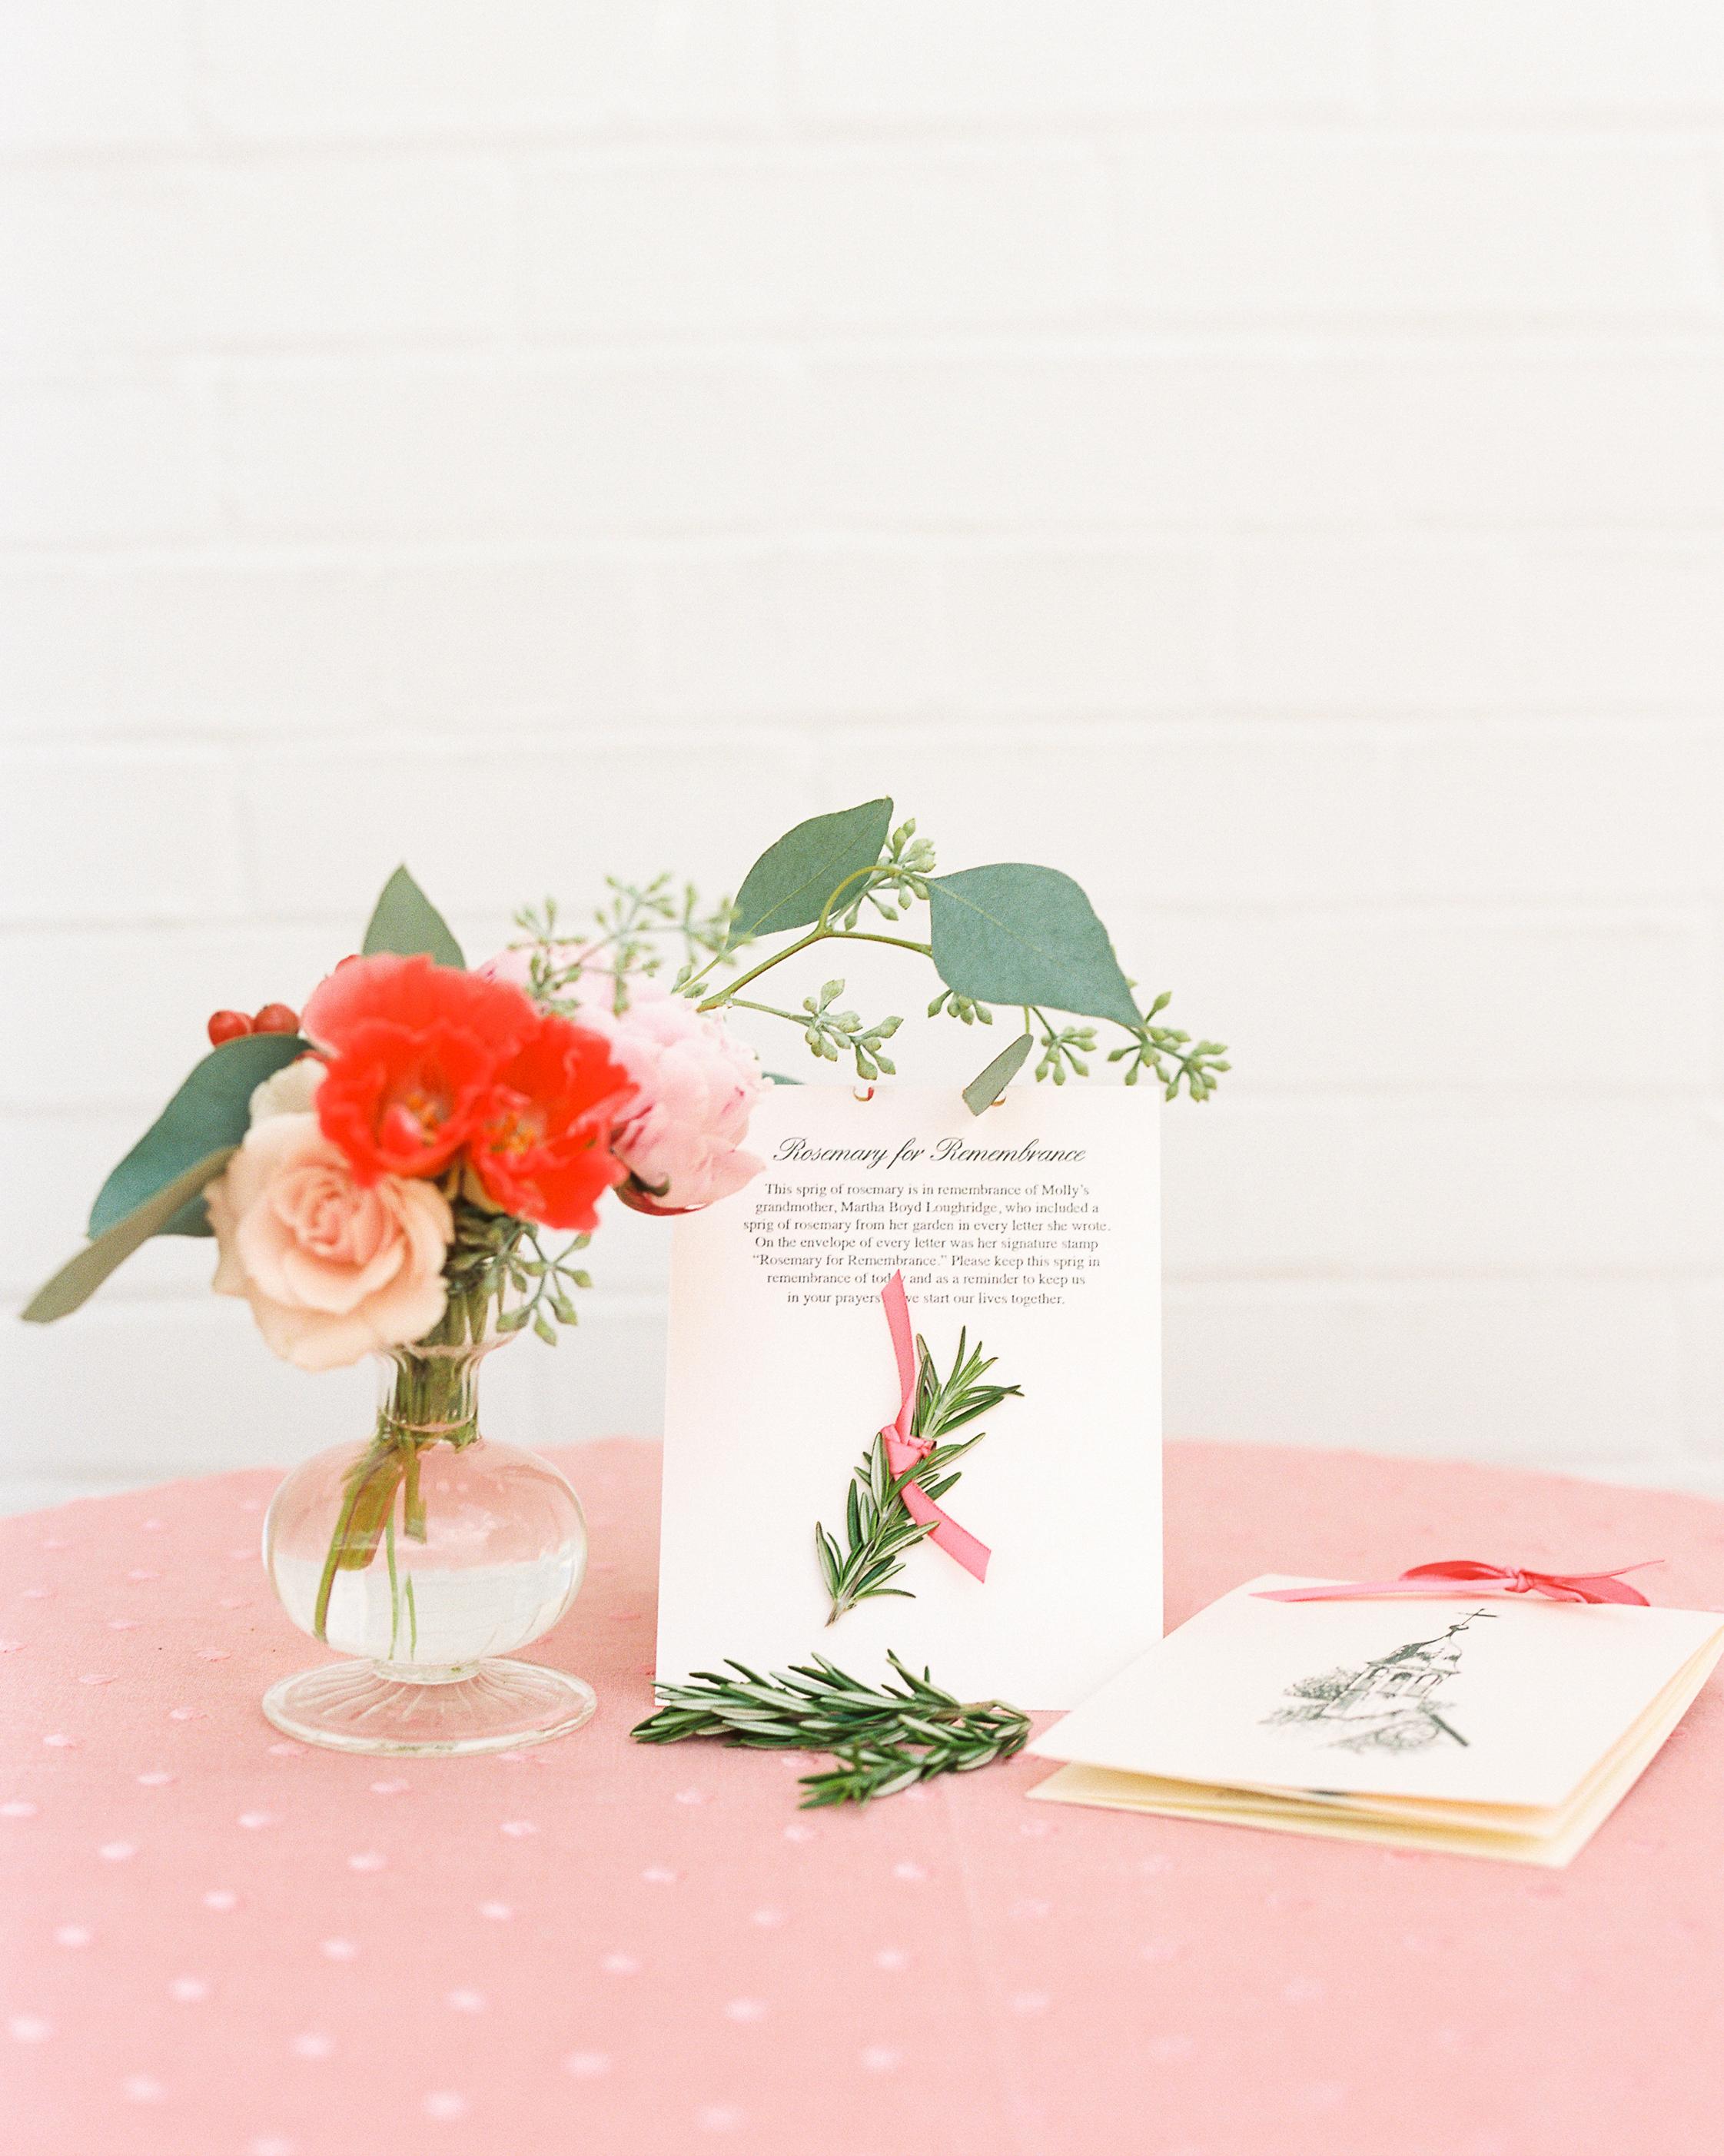 molly-patrick-wedding-programs-3044-s111760-0115.jpg